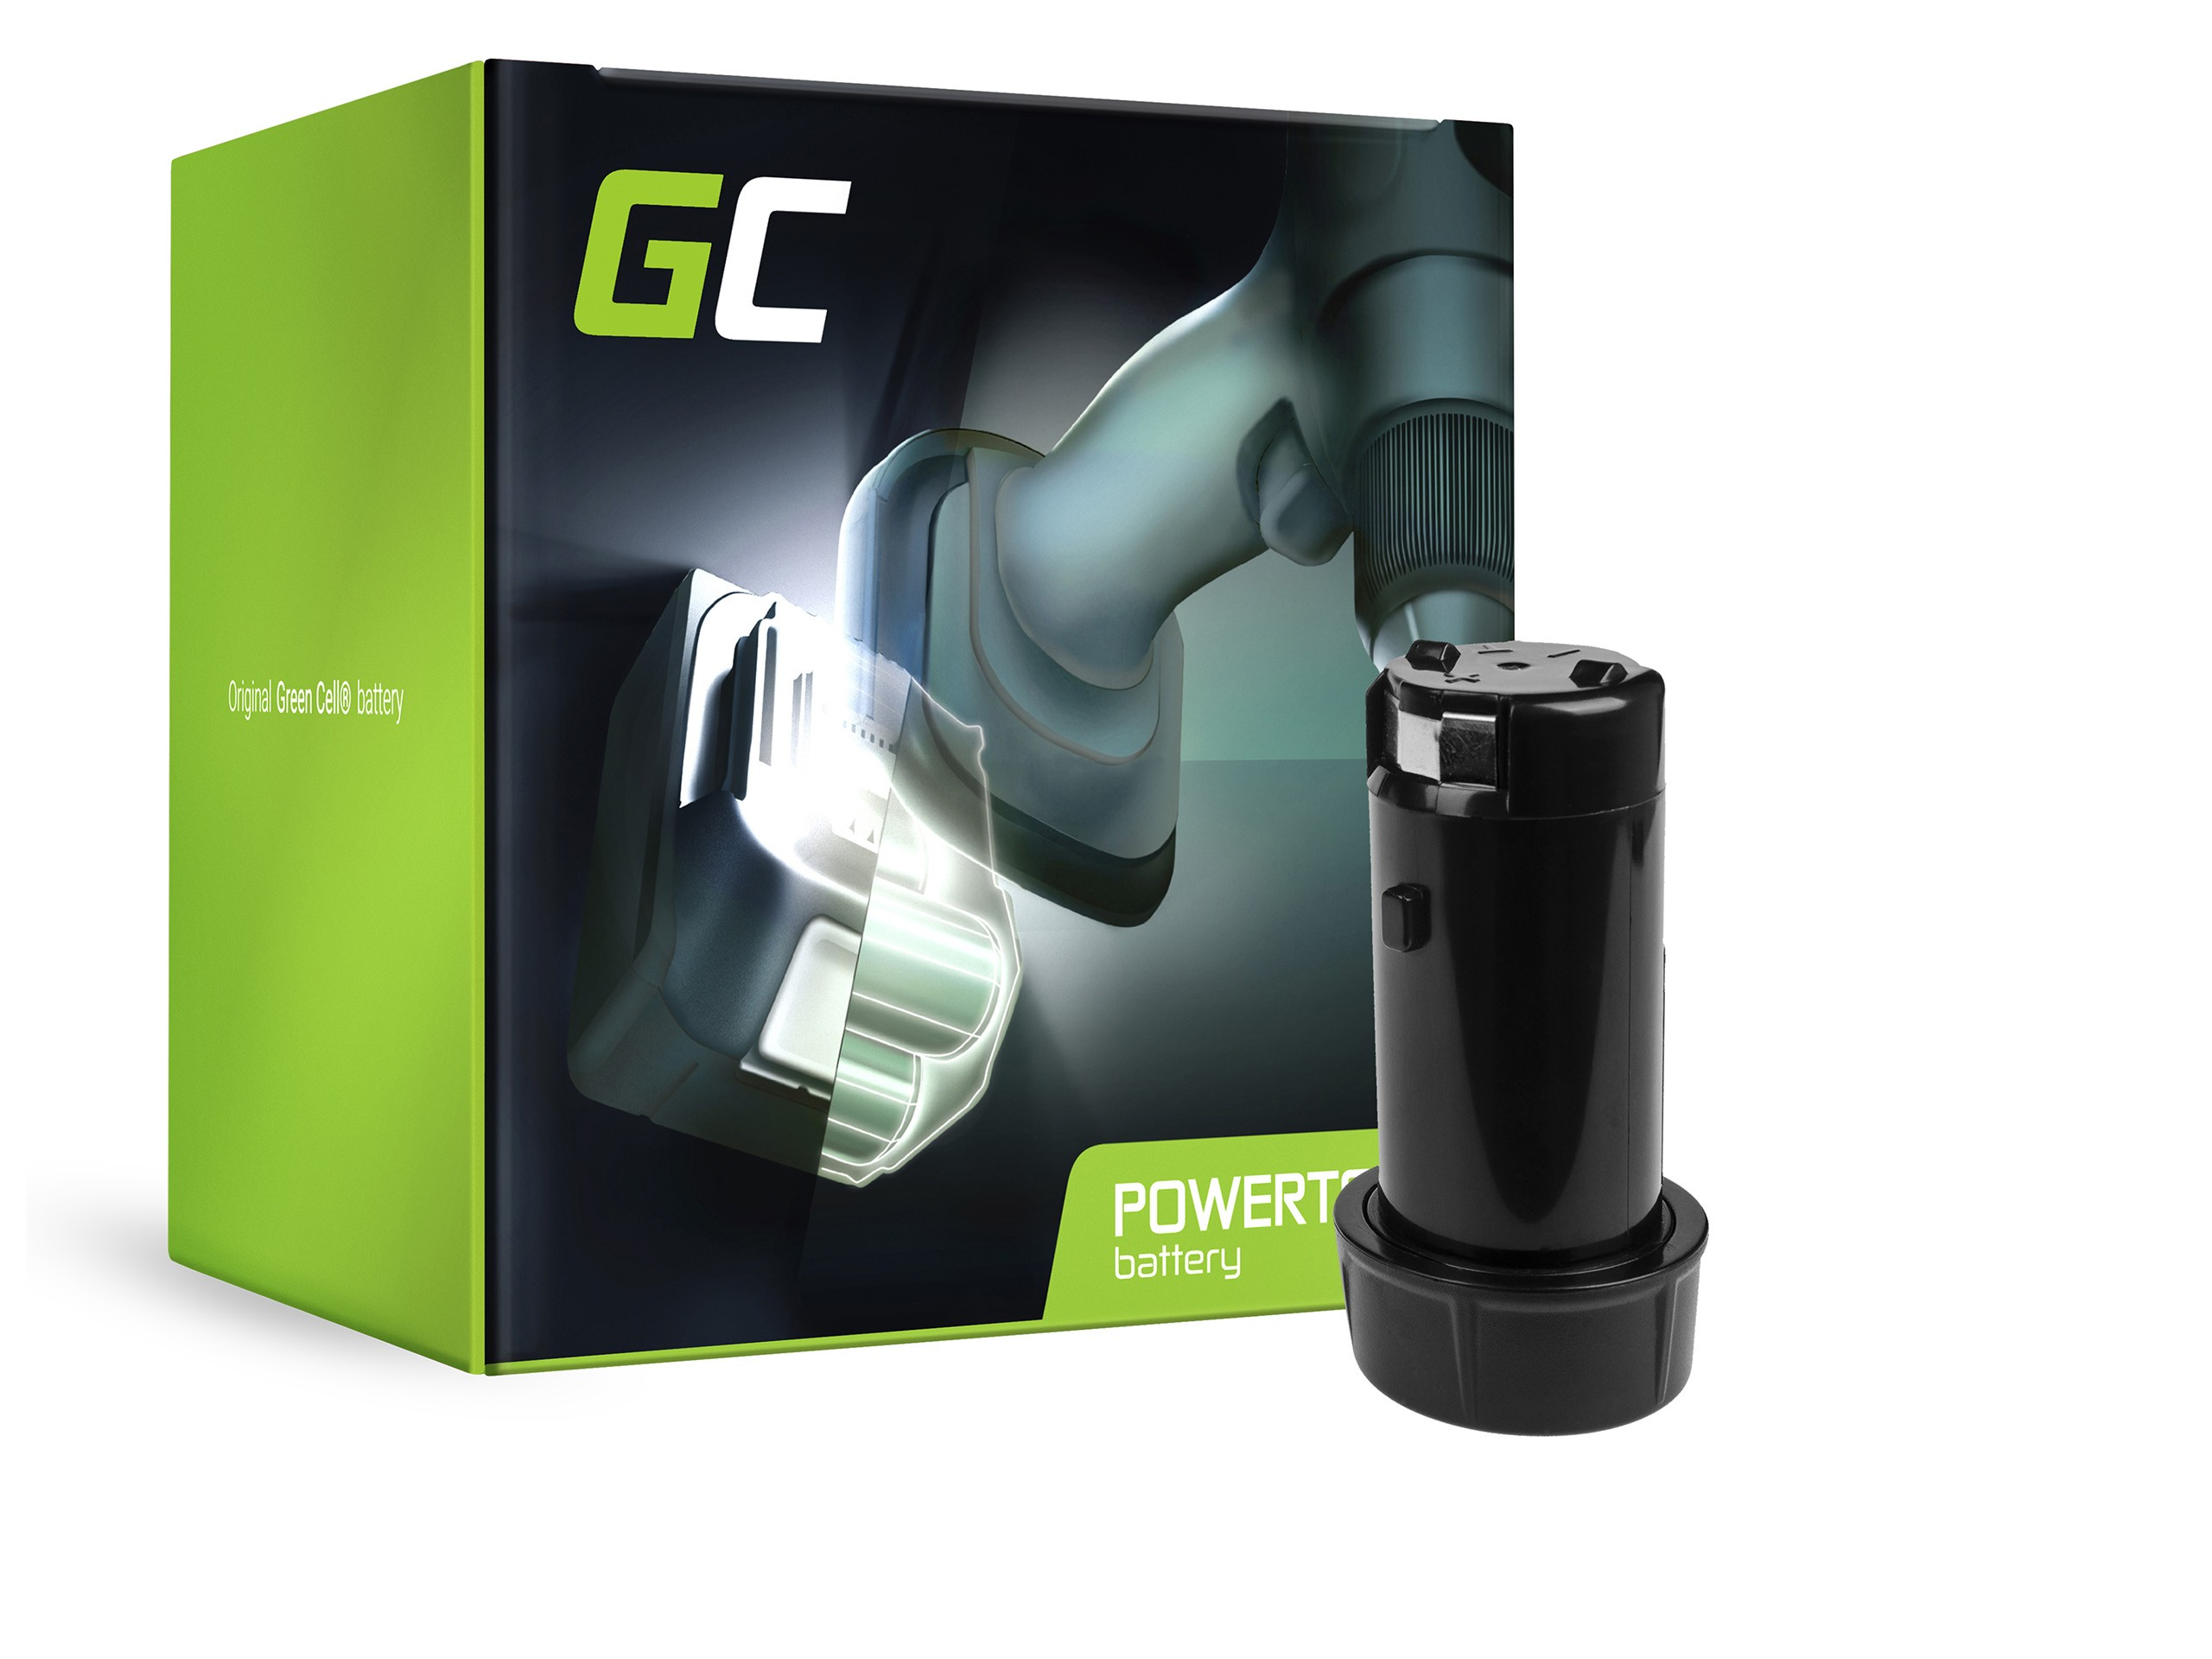 Green Cellverktygsbatteri M4 B2 48-11-0490 48-11-2001 för Milwaukee M4 D-202B M4C M4 2101-20 M4 2101-22 0490-20 0490-22